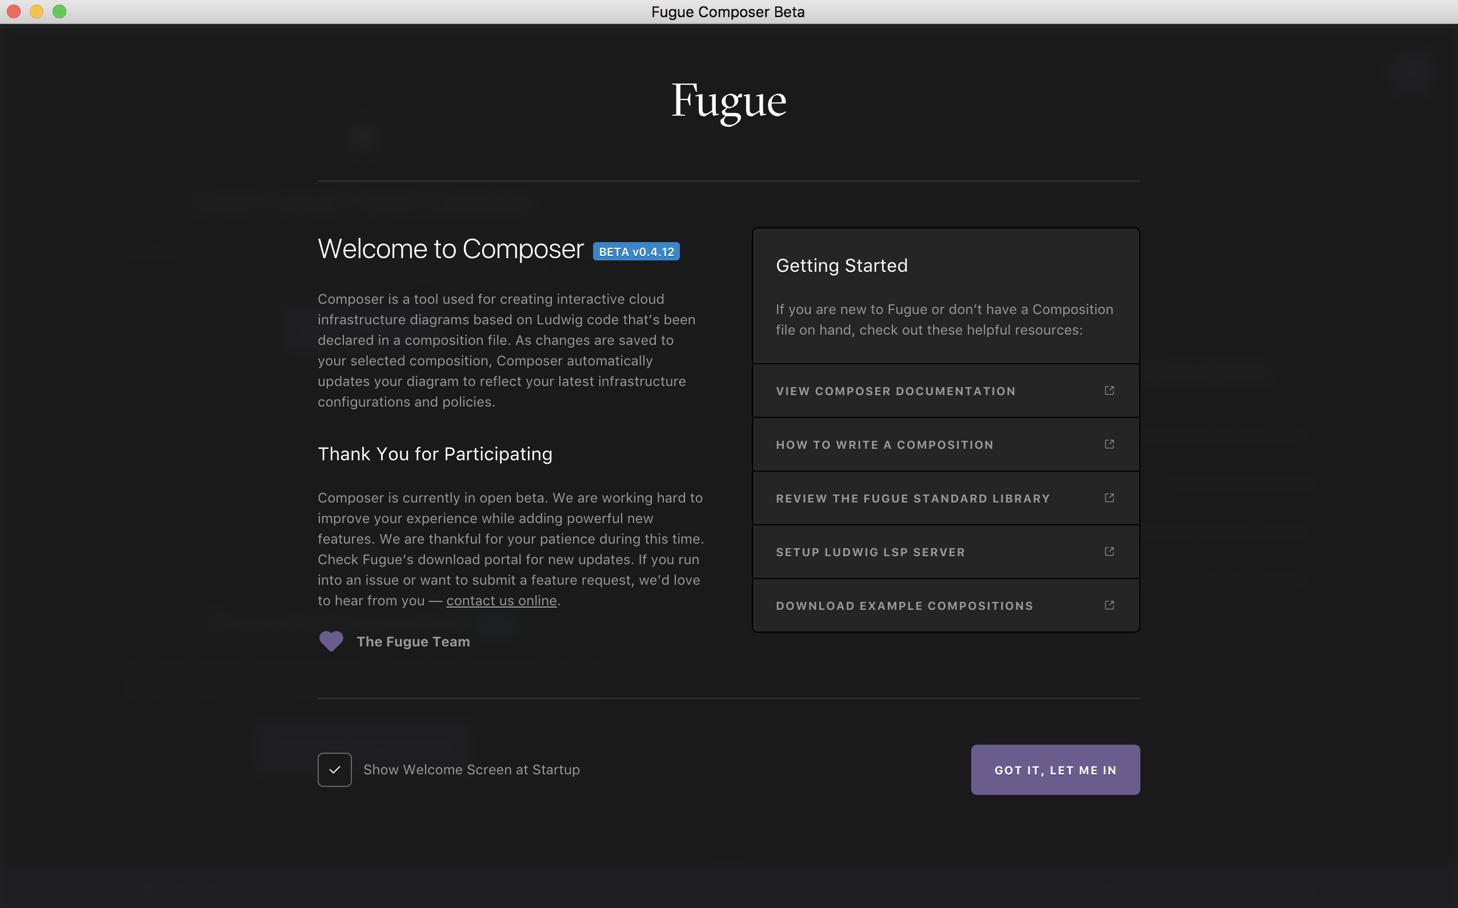 Fugue Composer First Time User Screen